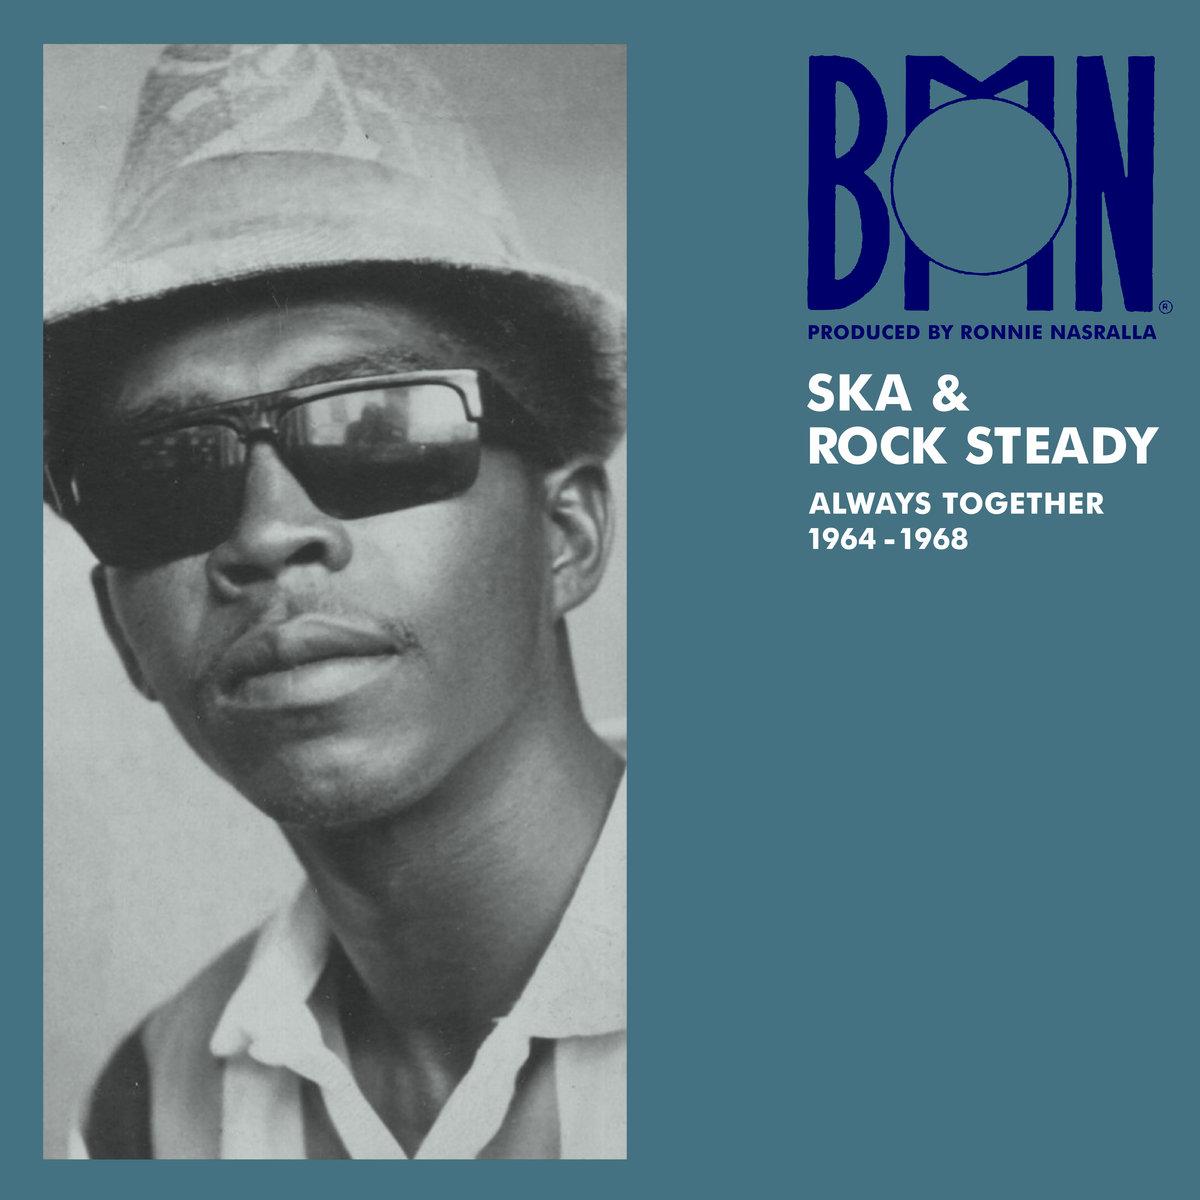 Download lagu ska rocksteady.